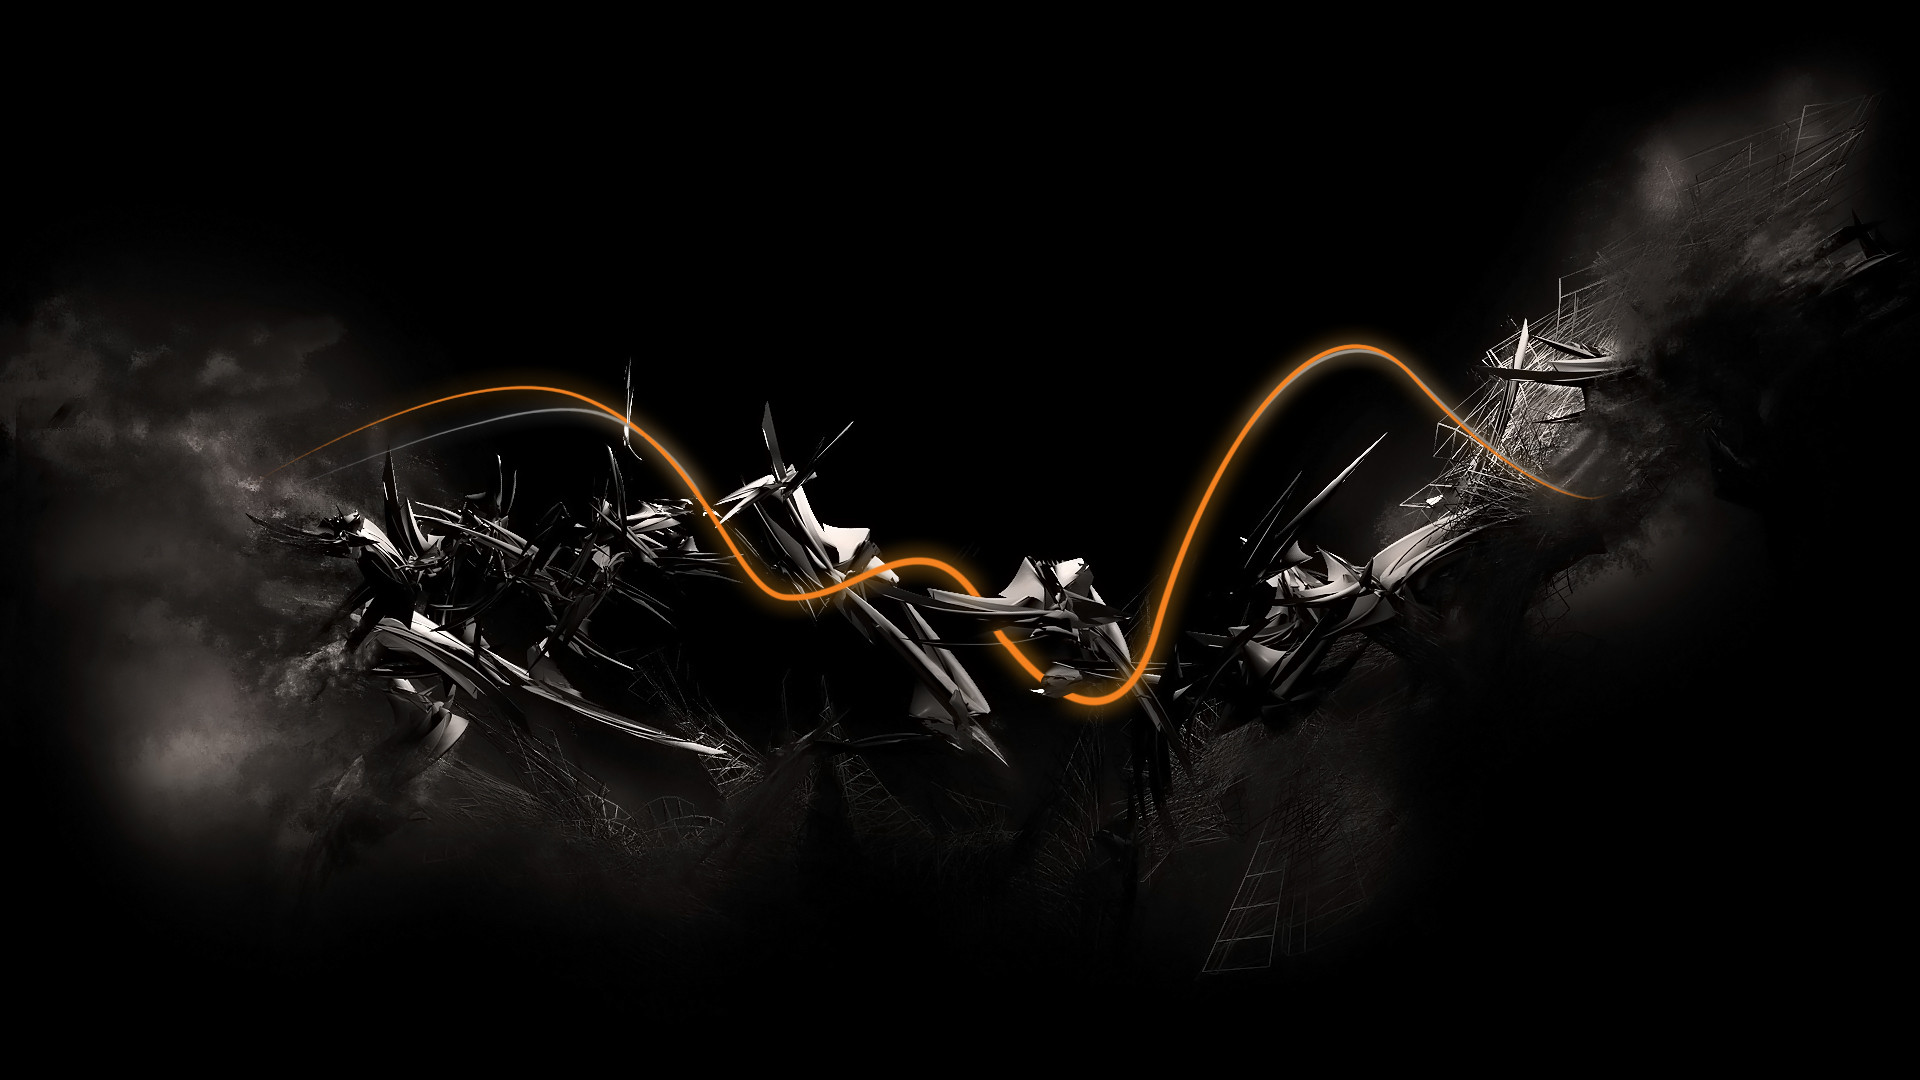 Black Abstract wallpaper – 608410